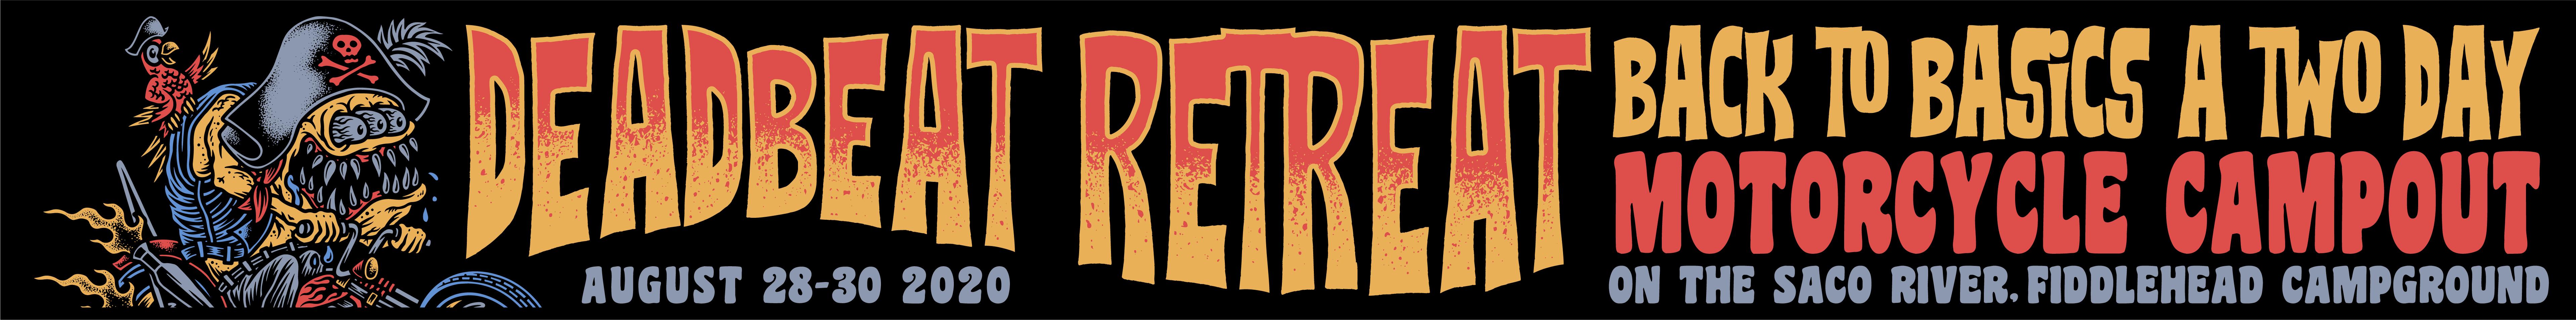 retreat-website-long.jpg